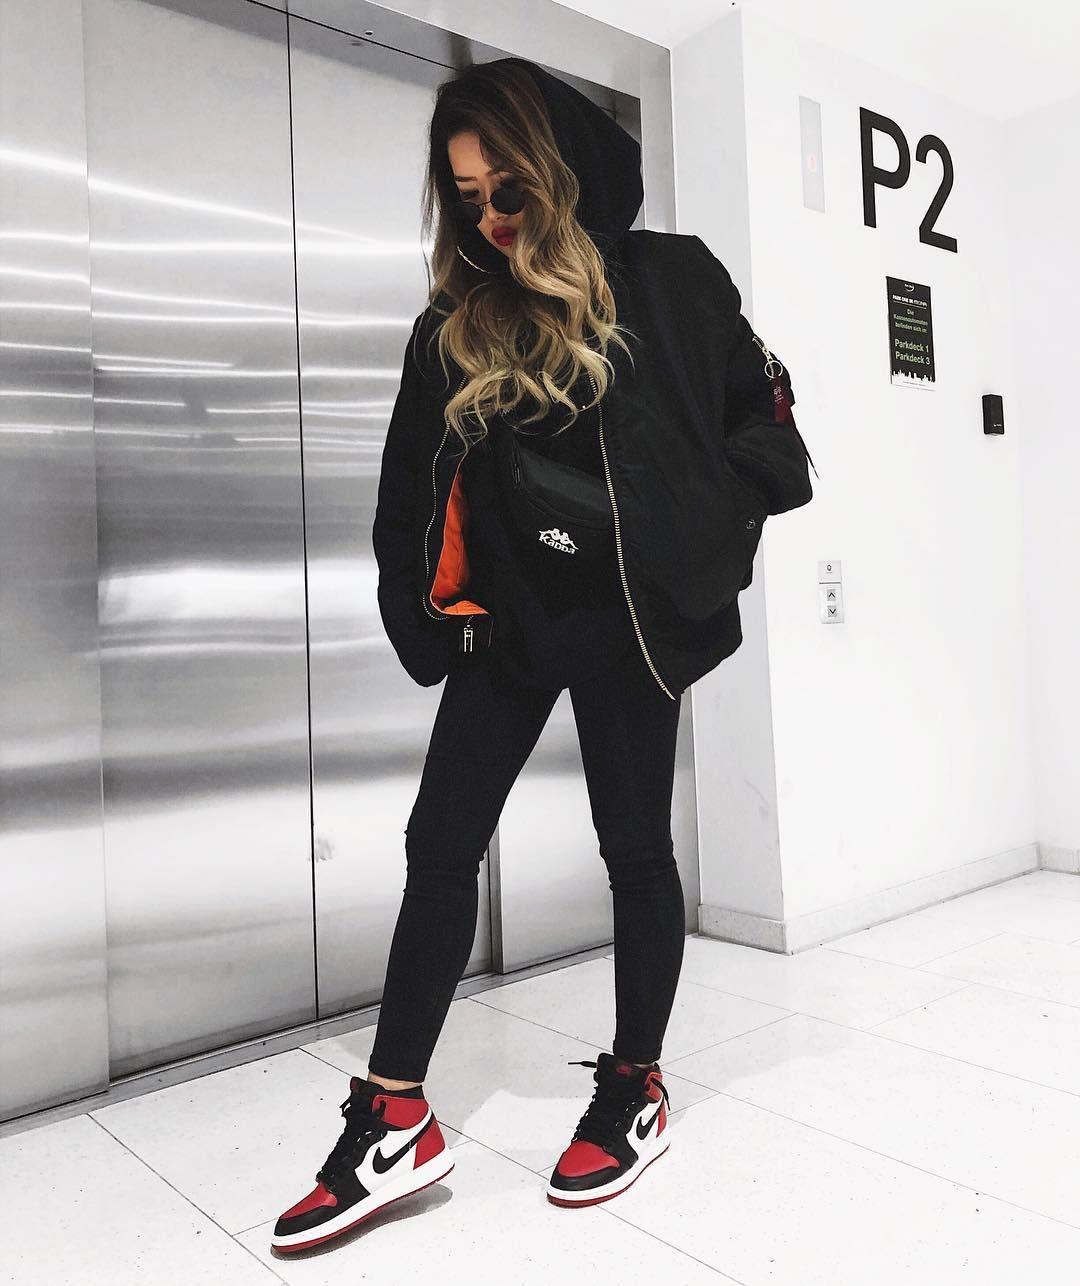 cooles streetwear outfit f r frauen all black look und dazu l ssige sneaker die nike air. Black Bedroom Furniture Sets. Home Design Ideas